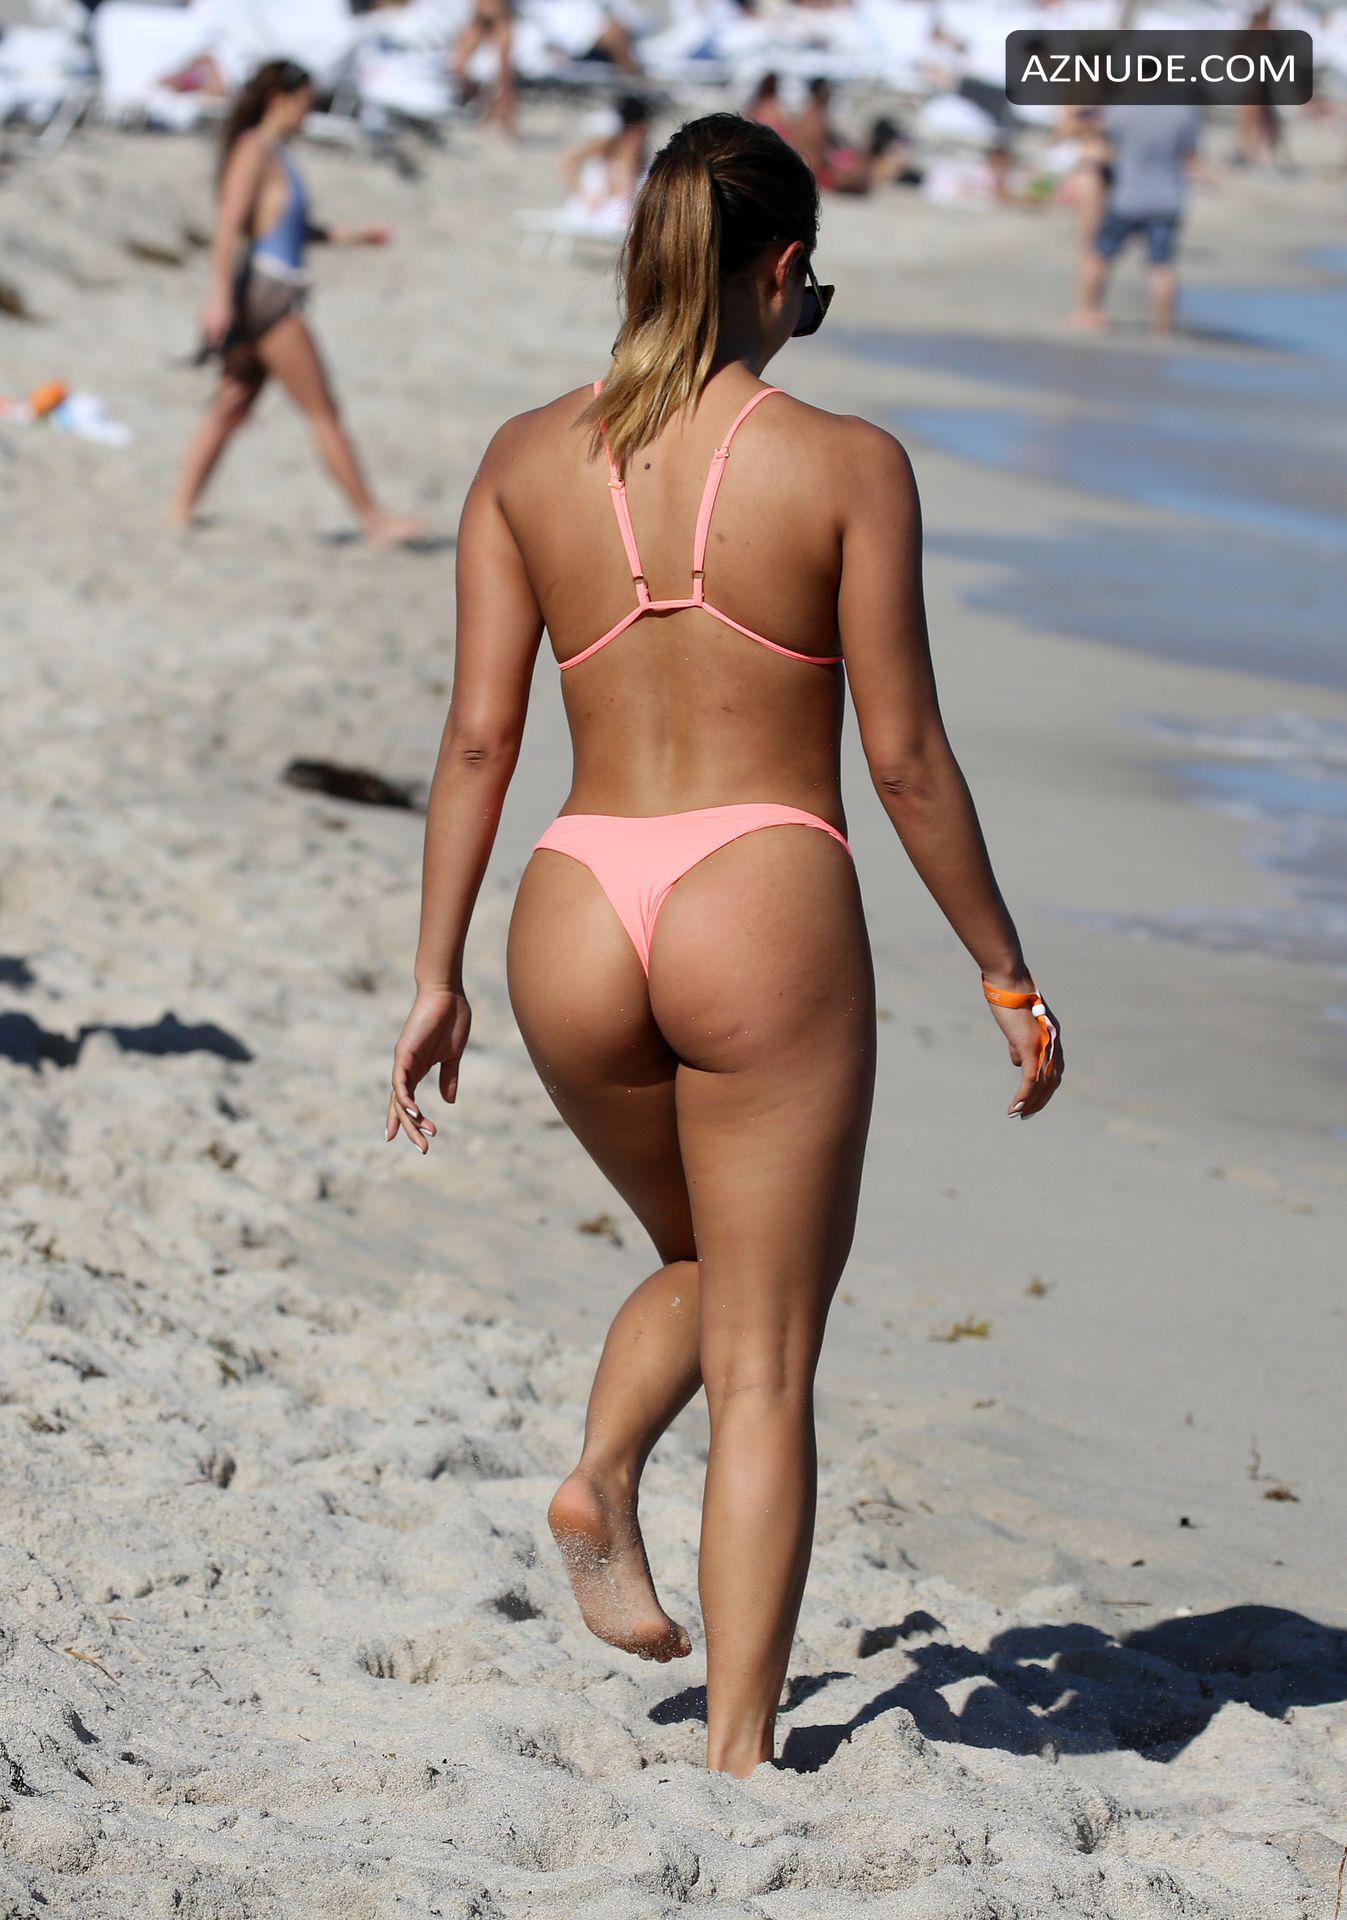 Cassidy Banks Nude | Hot Girl HD Wallpaper